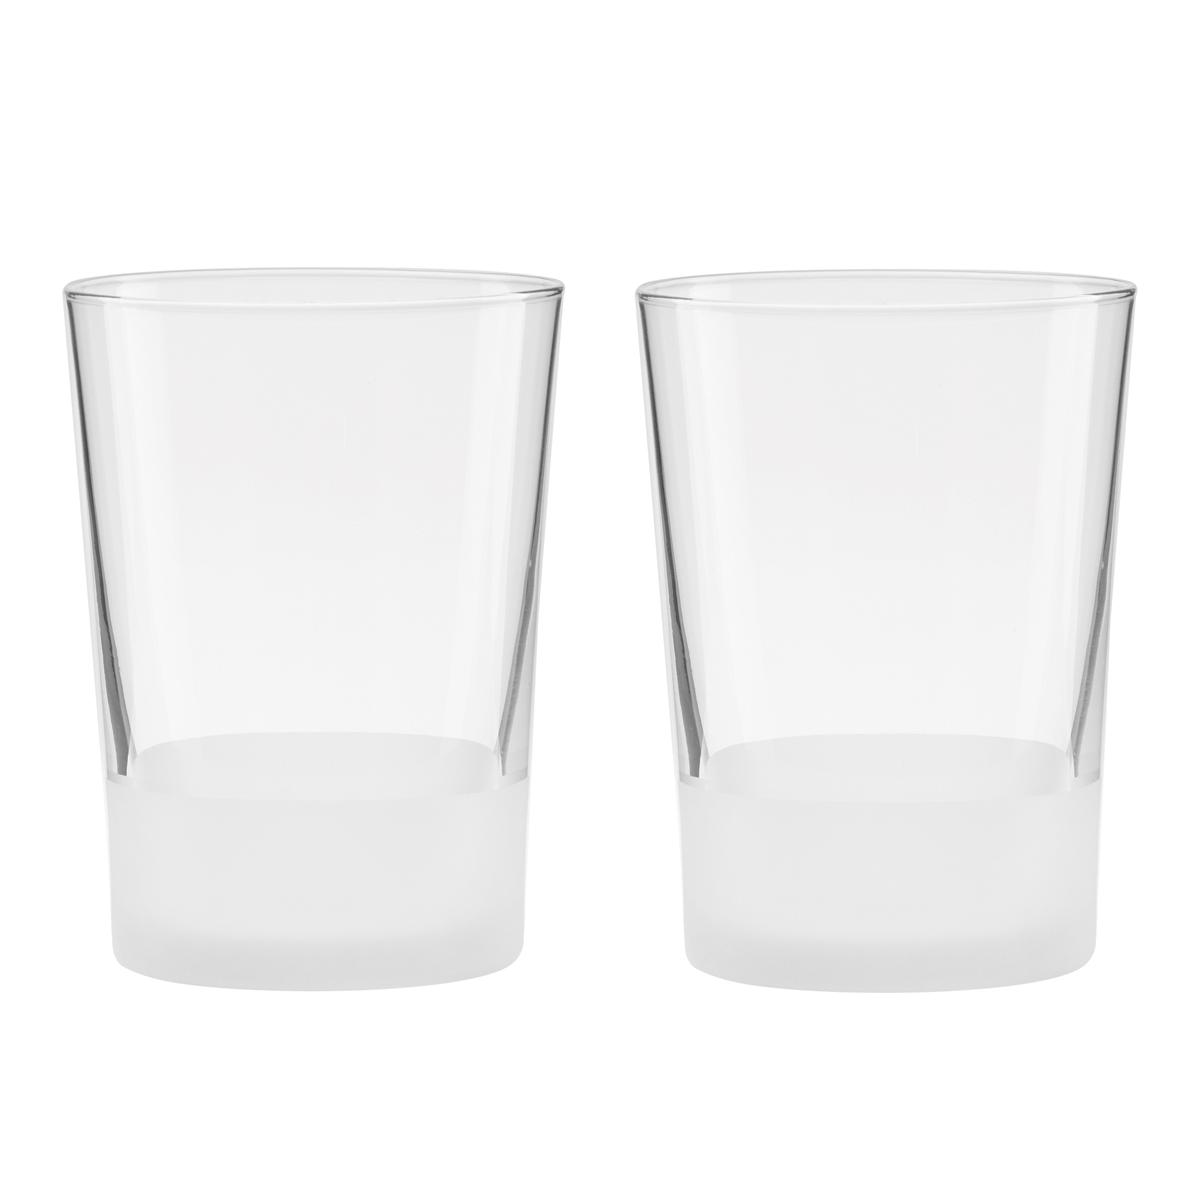 Kate Spade New York, Lenox Glass Nolita Clear 12 oz, Set of 2